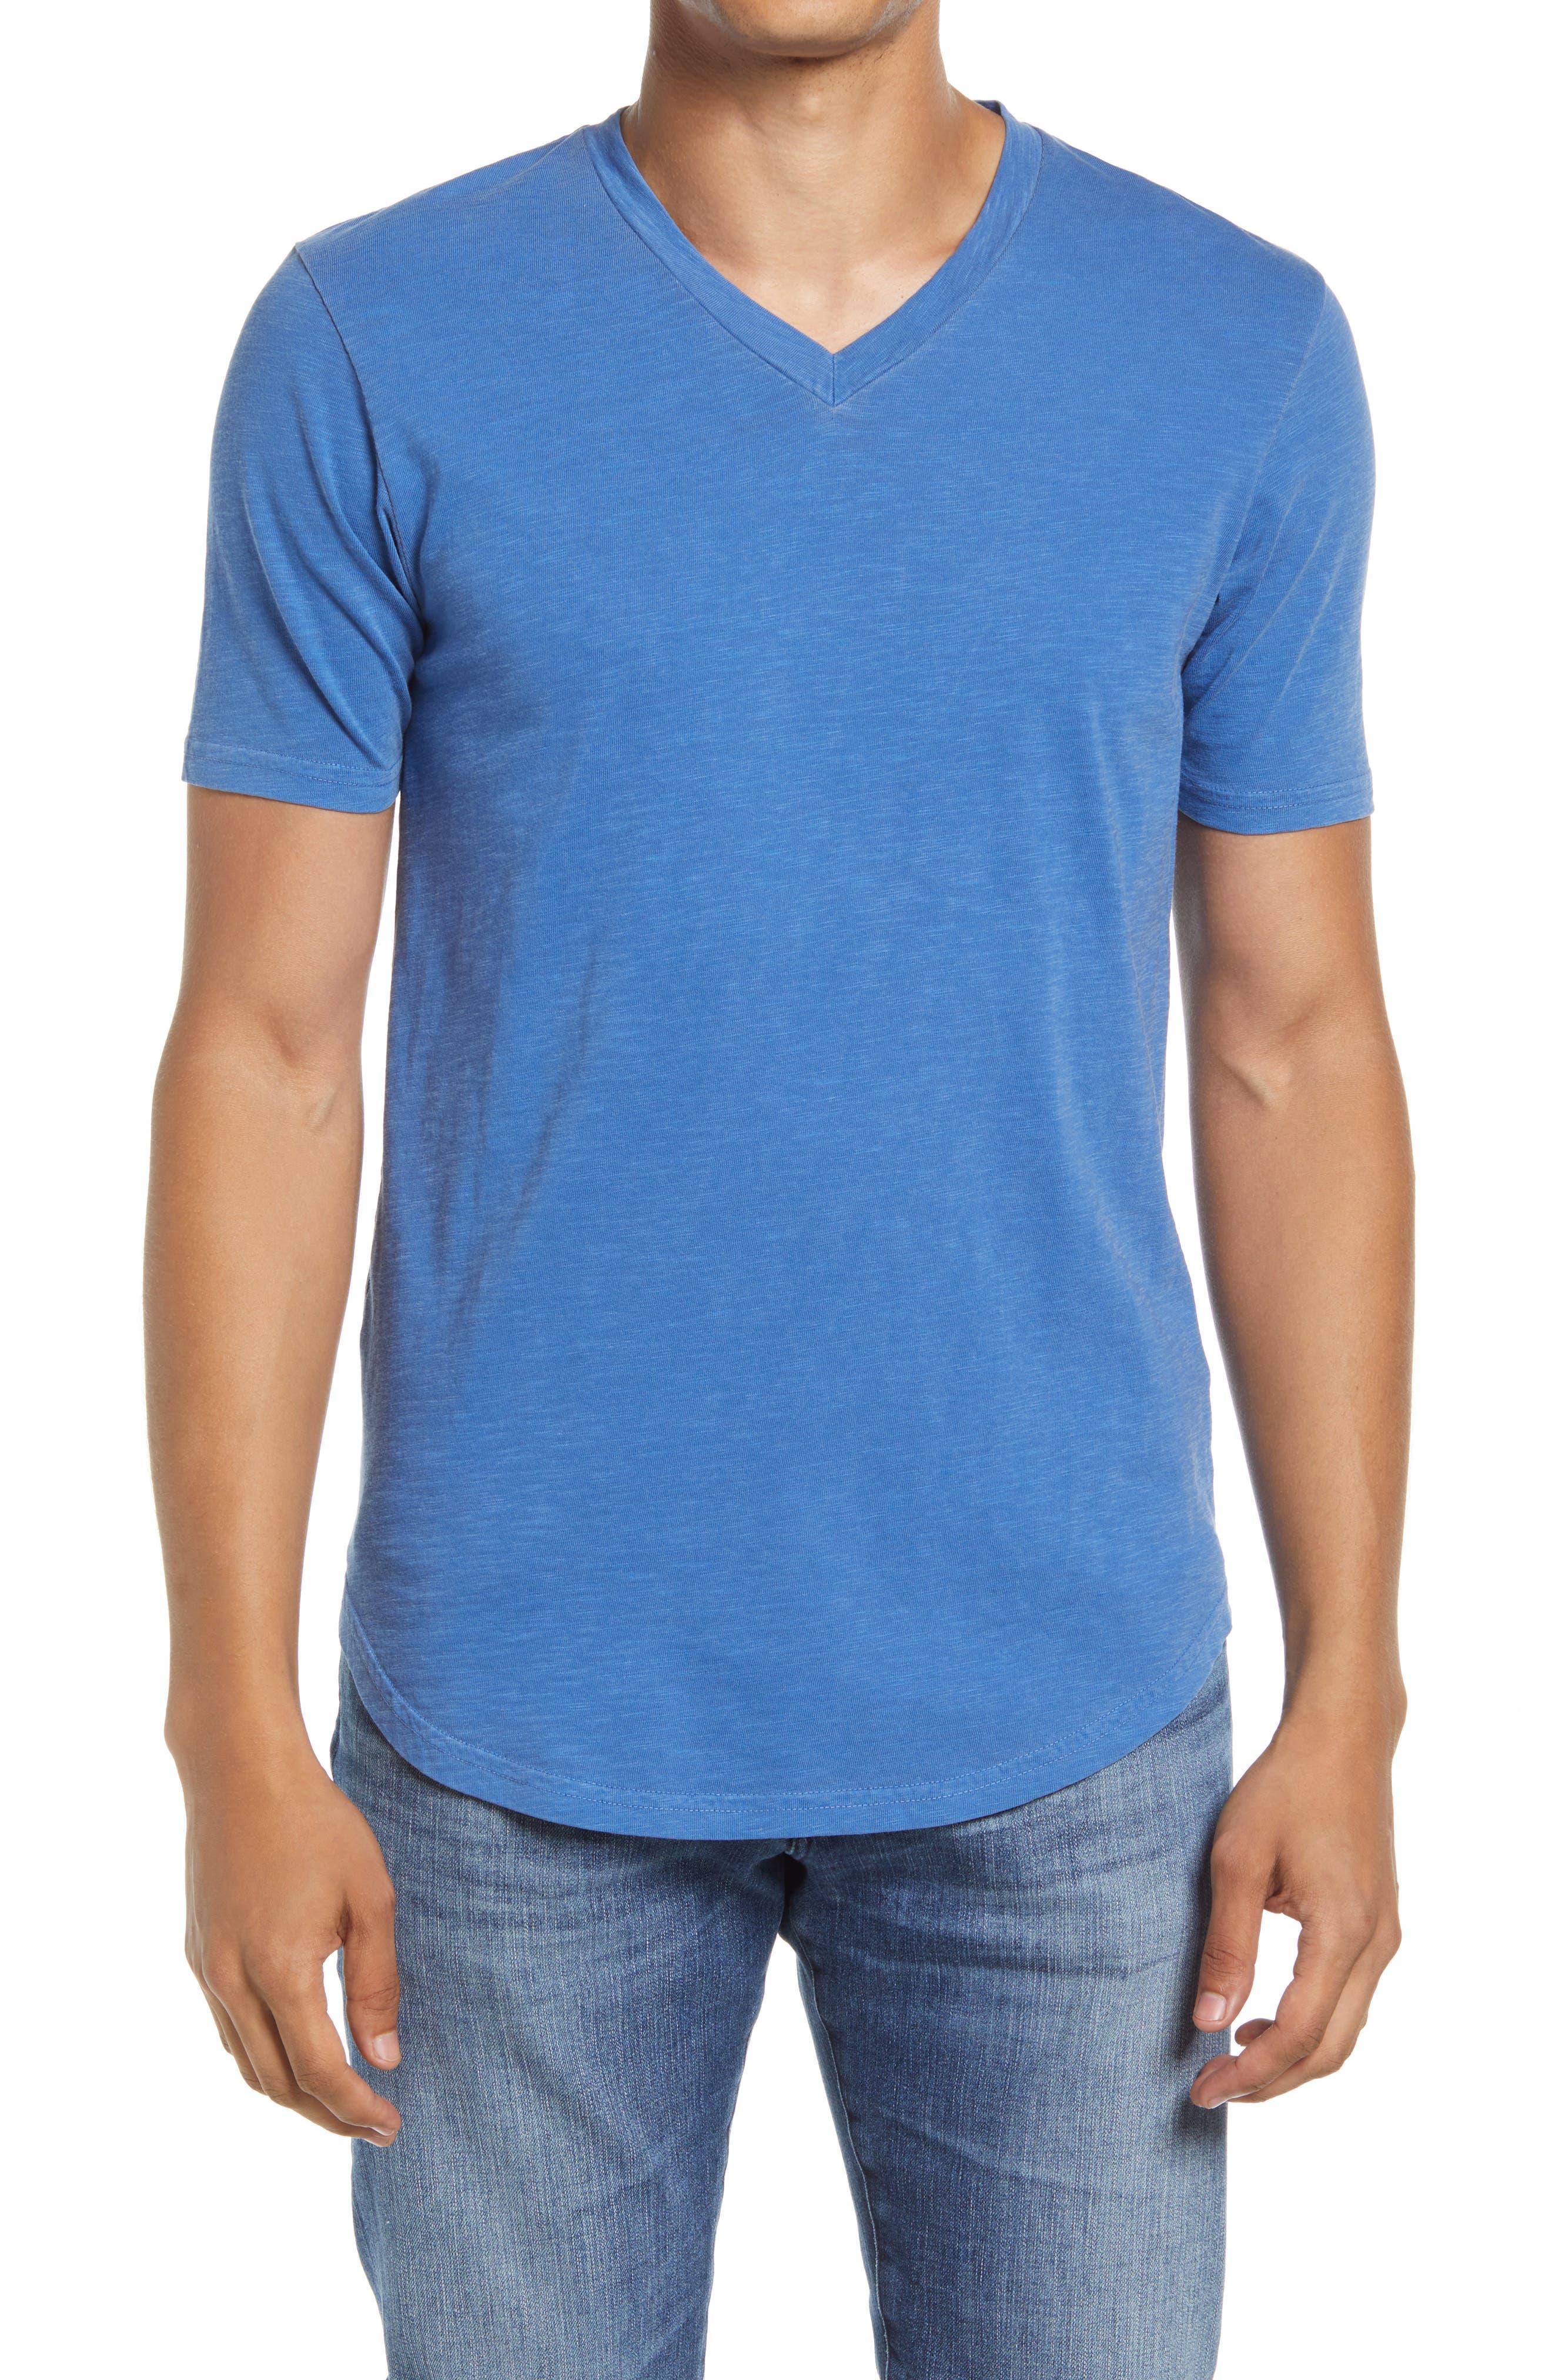 Scallop Short Sleeve V-Neck T-Shirt